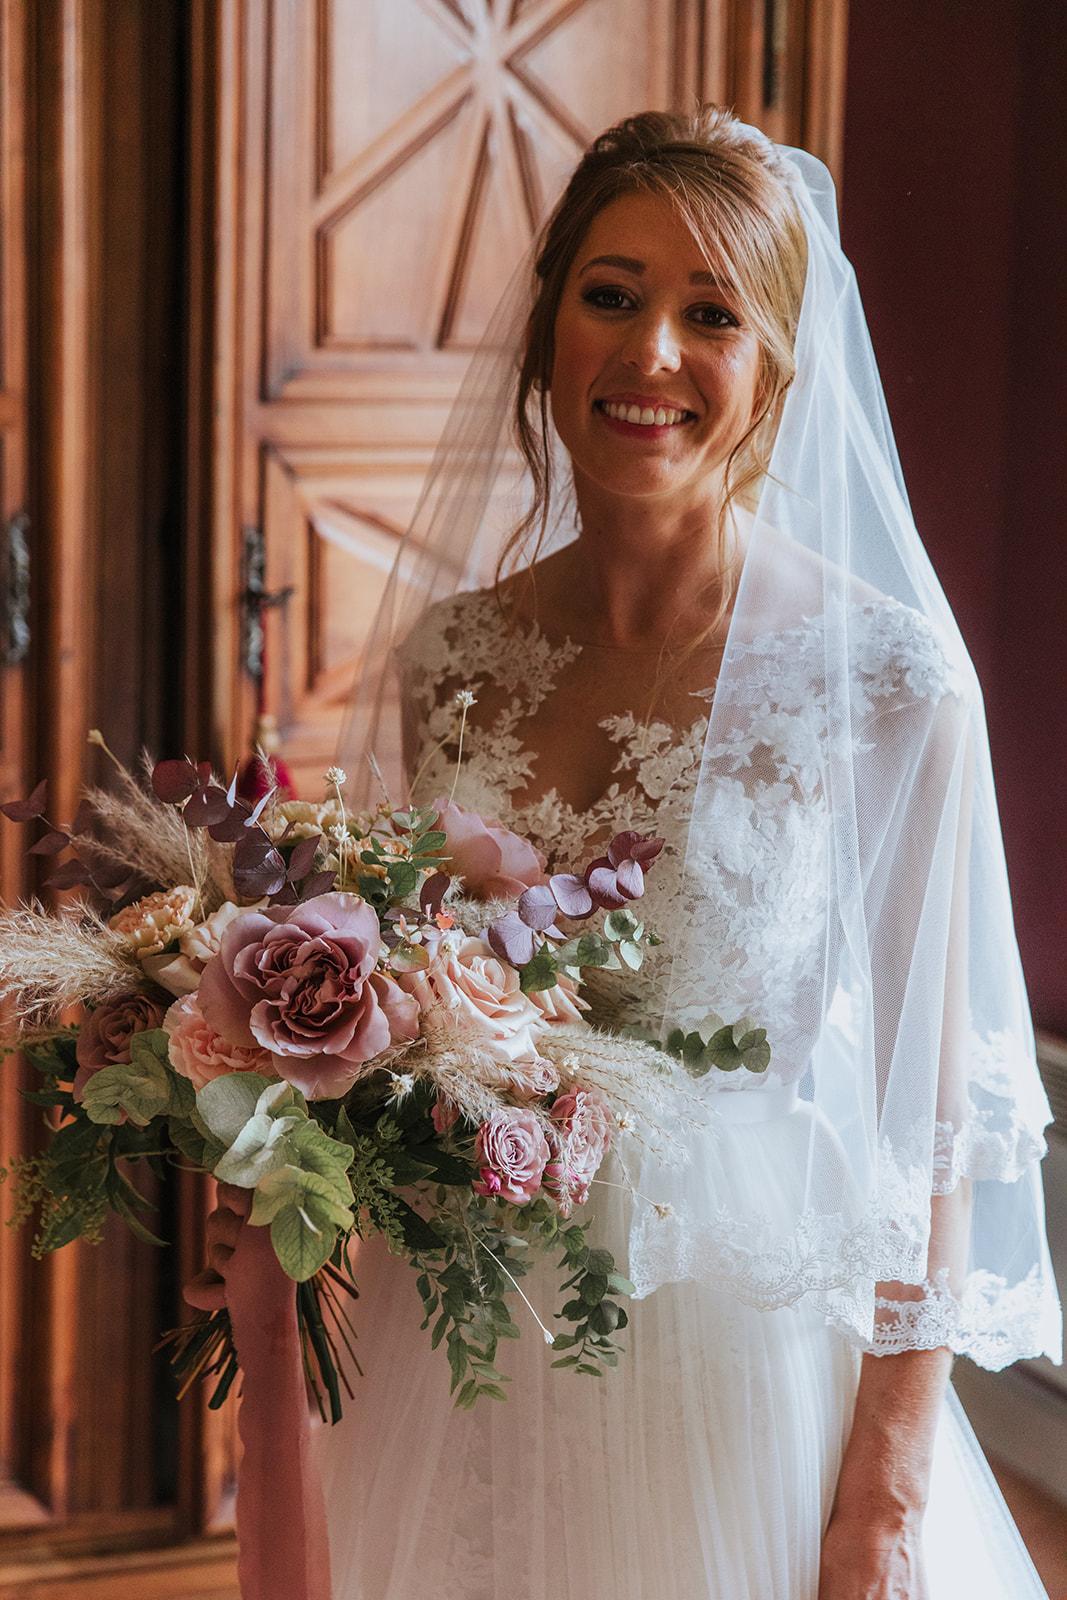 mariée, future mariée, bouquet de mariée, fleurs de mariage, fleuriste, fleuriste paris, fleuriste mariage, mariage raffiné